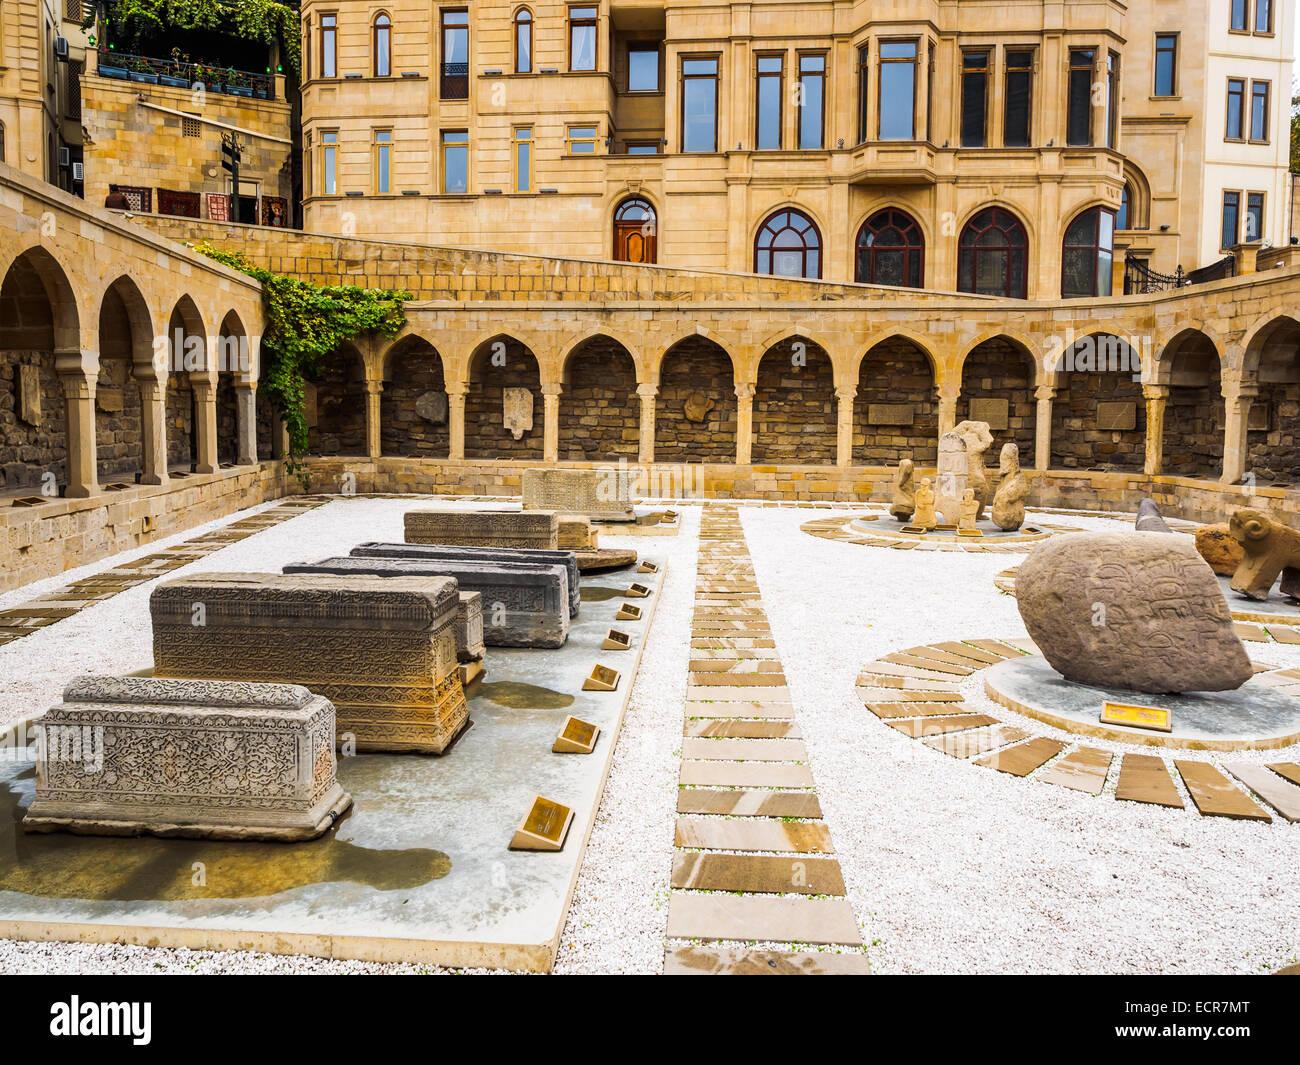 Ancient Market in Old City of Baku, Azerbaijan - Stock Image